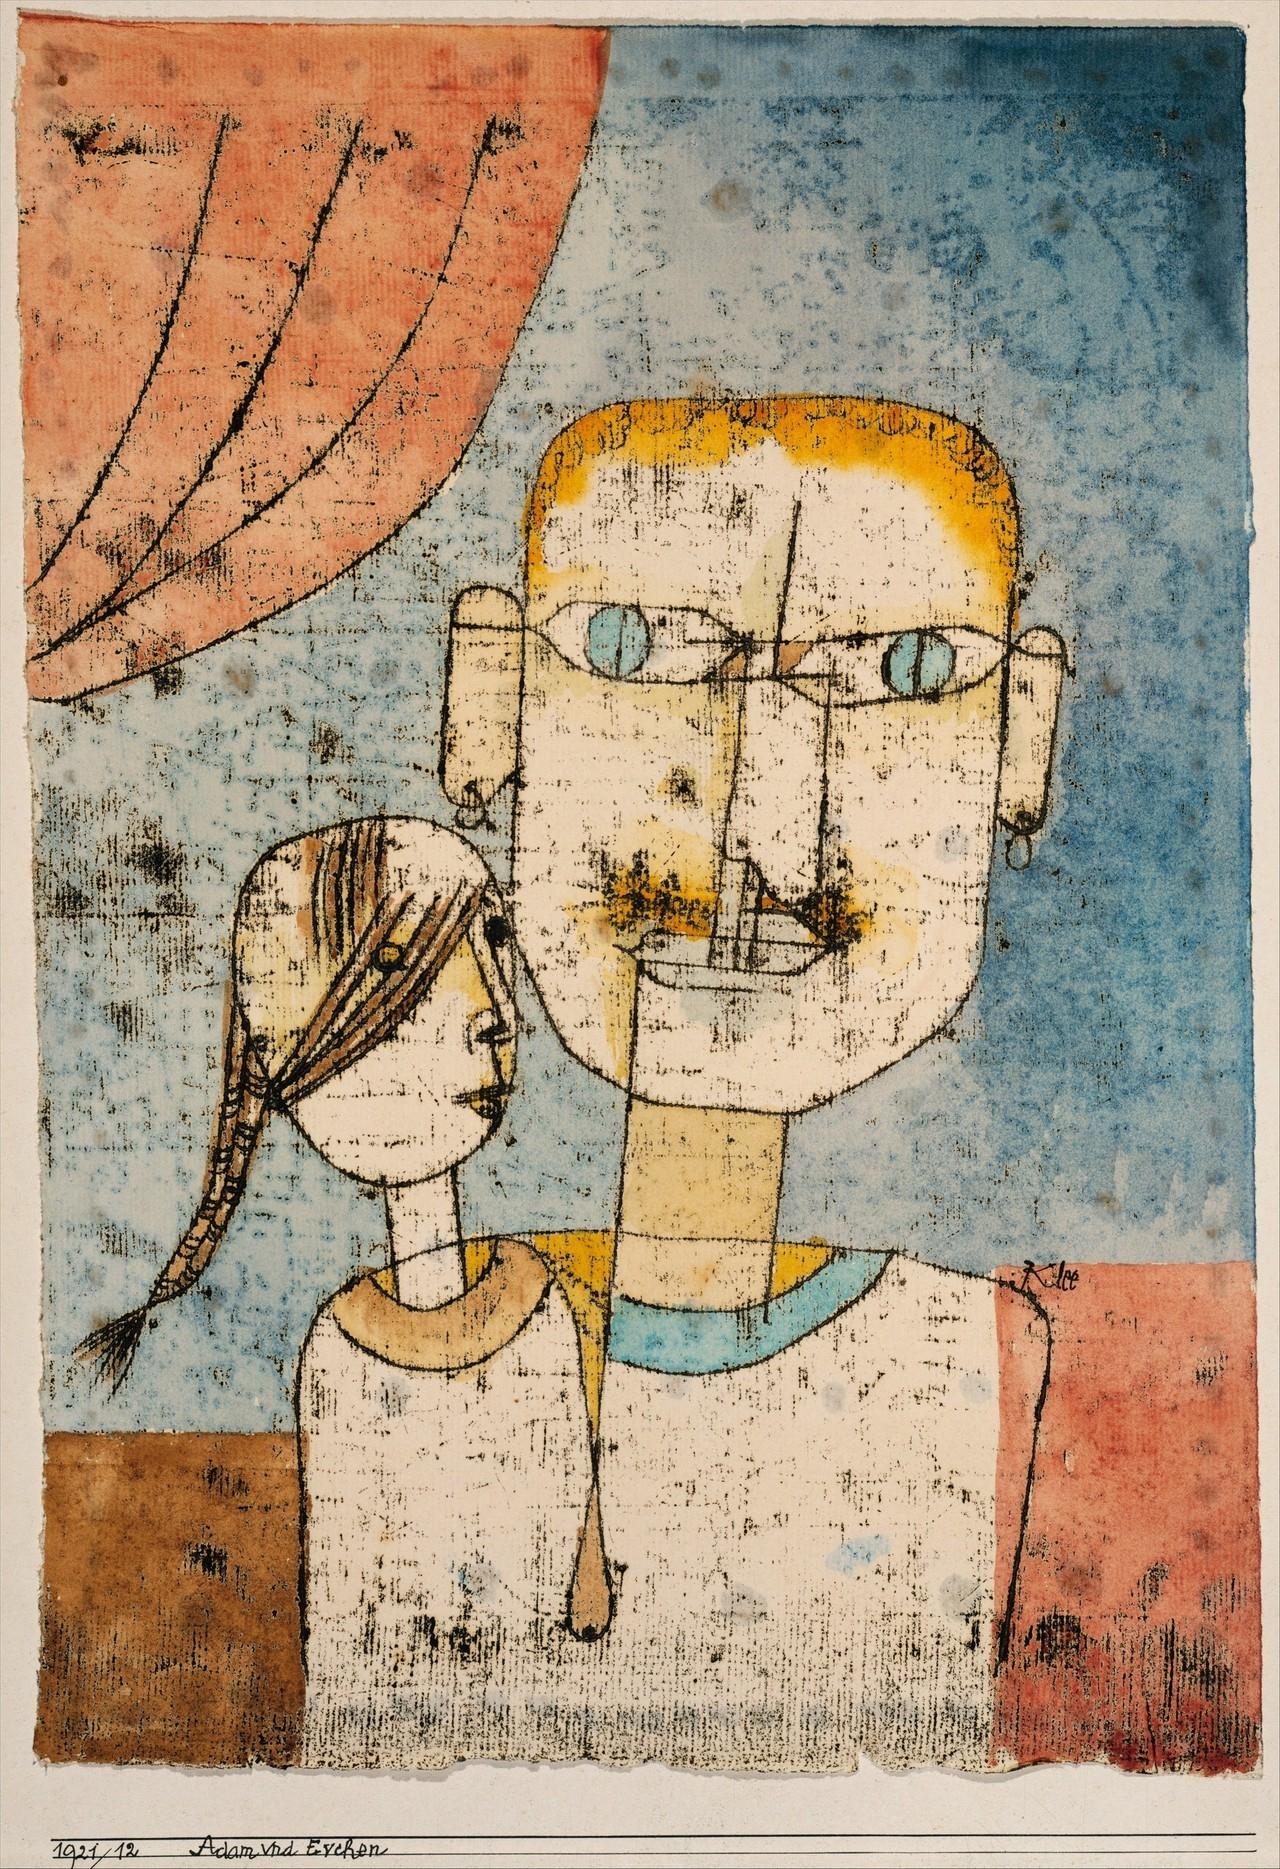 Paul Klee: Adam Eve, 1927 - arthurboehm | ello